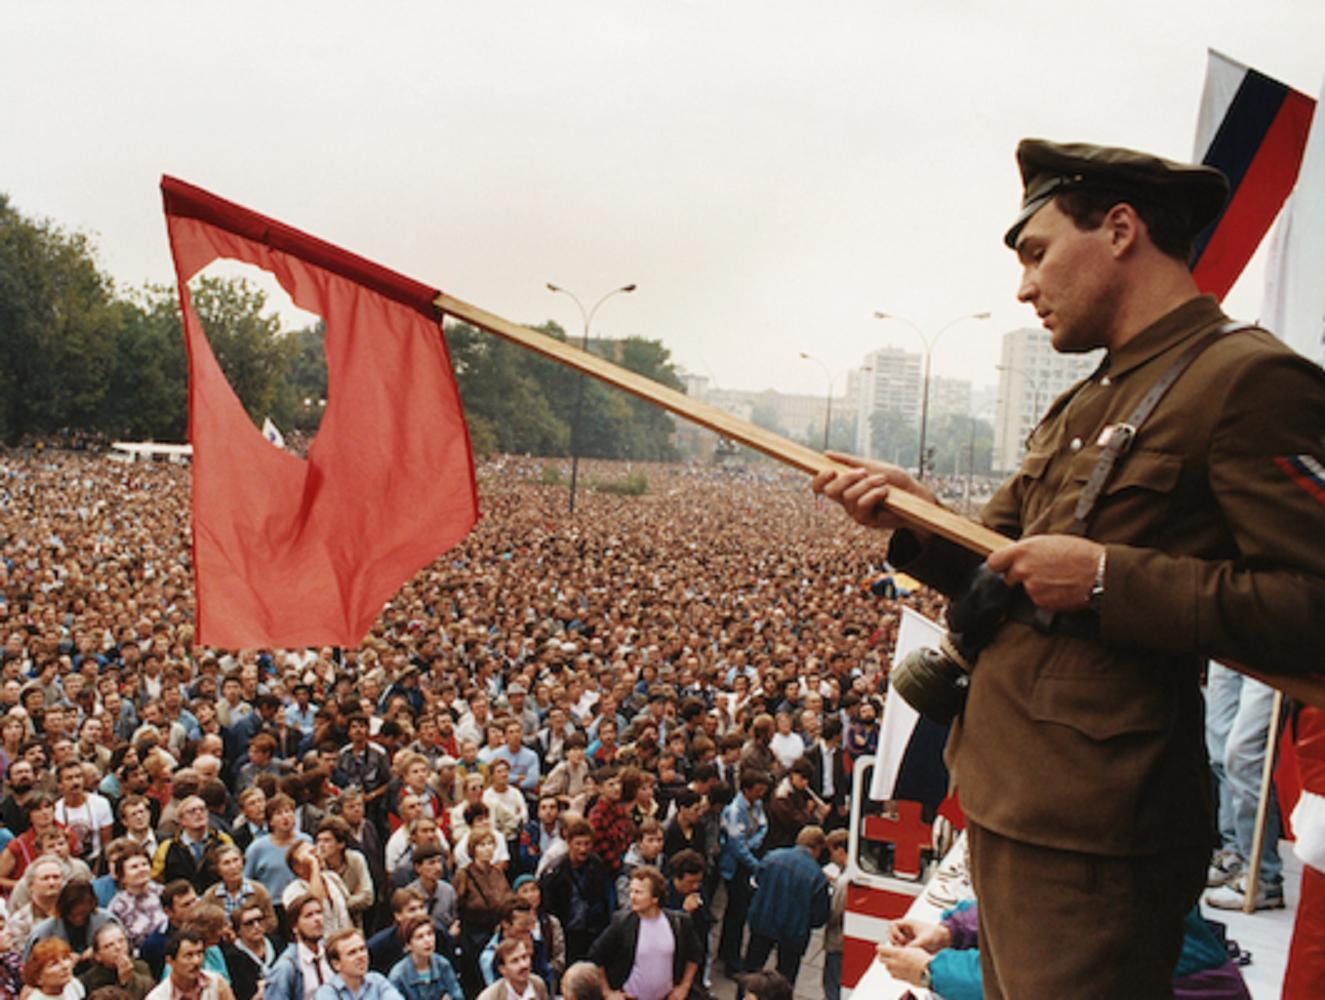 Protesting Overthrow of Mikhail Gorbachev